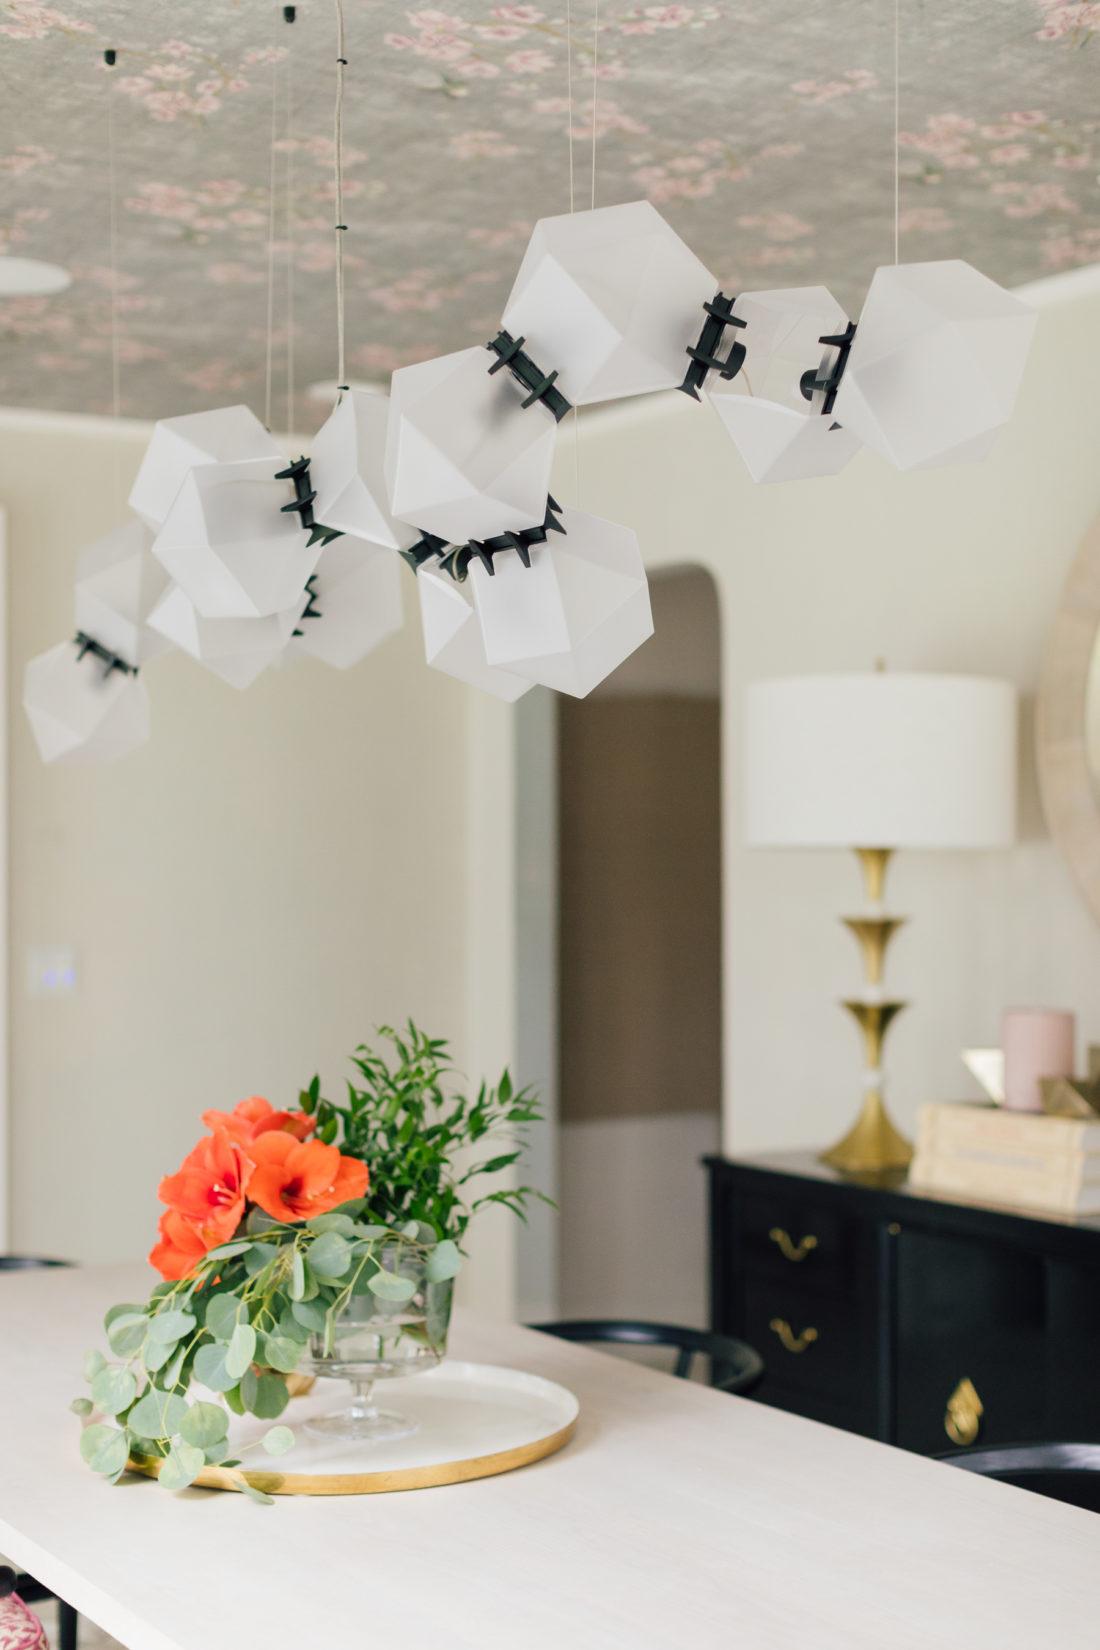 A closeup of the custom Gabriel Scott Chandelier in Eva Amurri Martino's newly renovated dining room